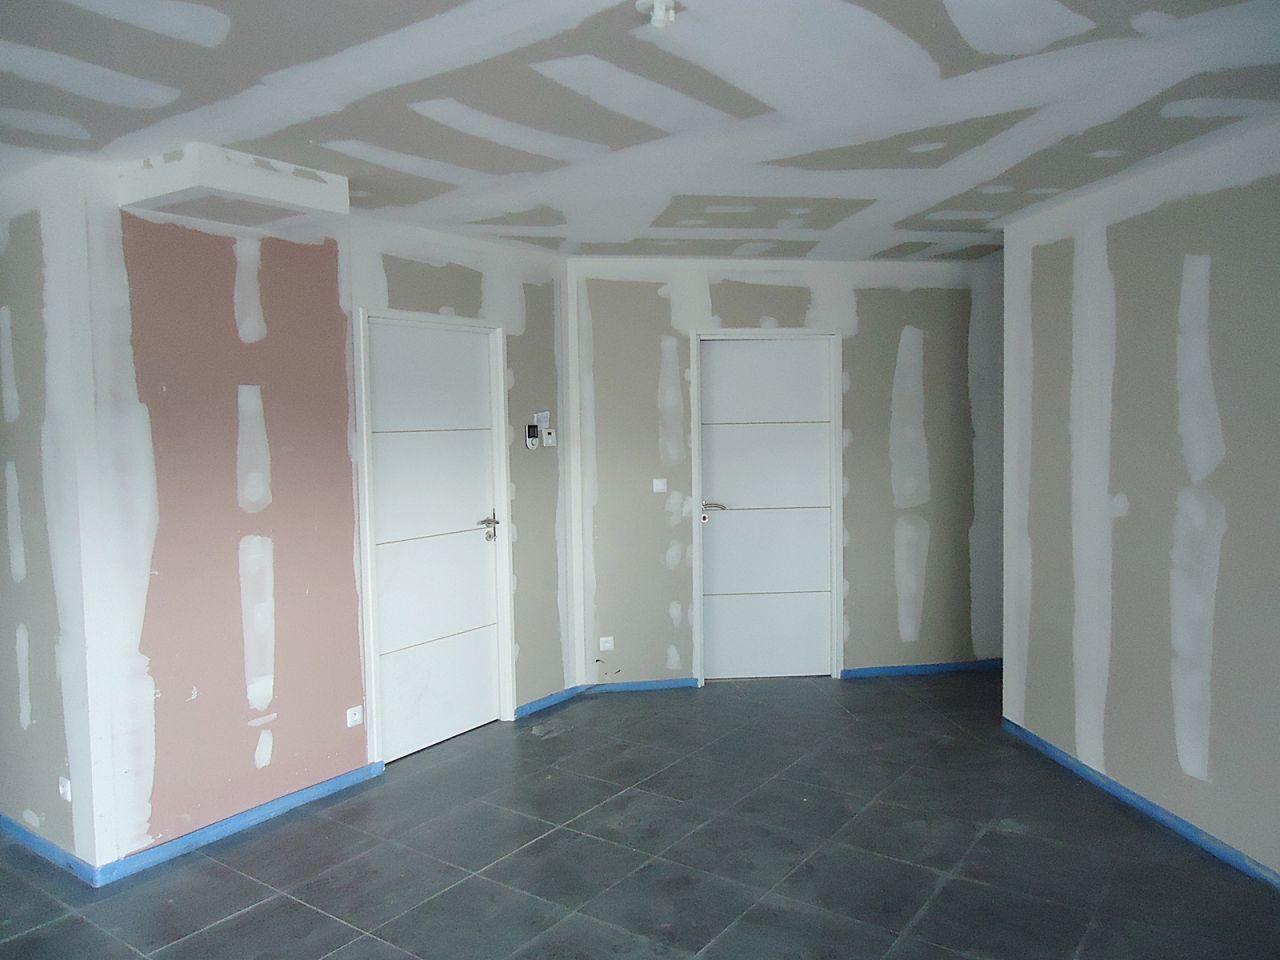 Carrelage fin peinture cellier terrassement terminer corbenay haute saone for Poser porte interieur